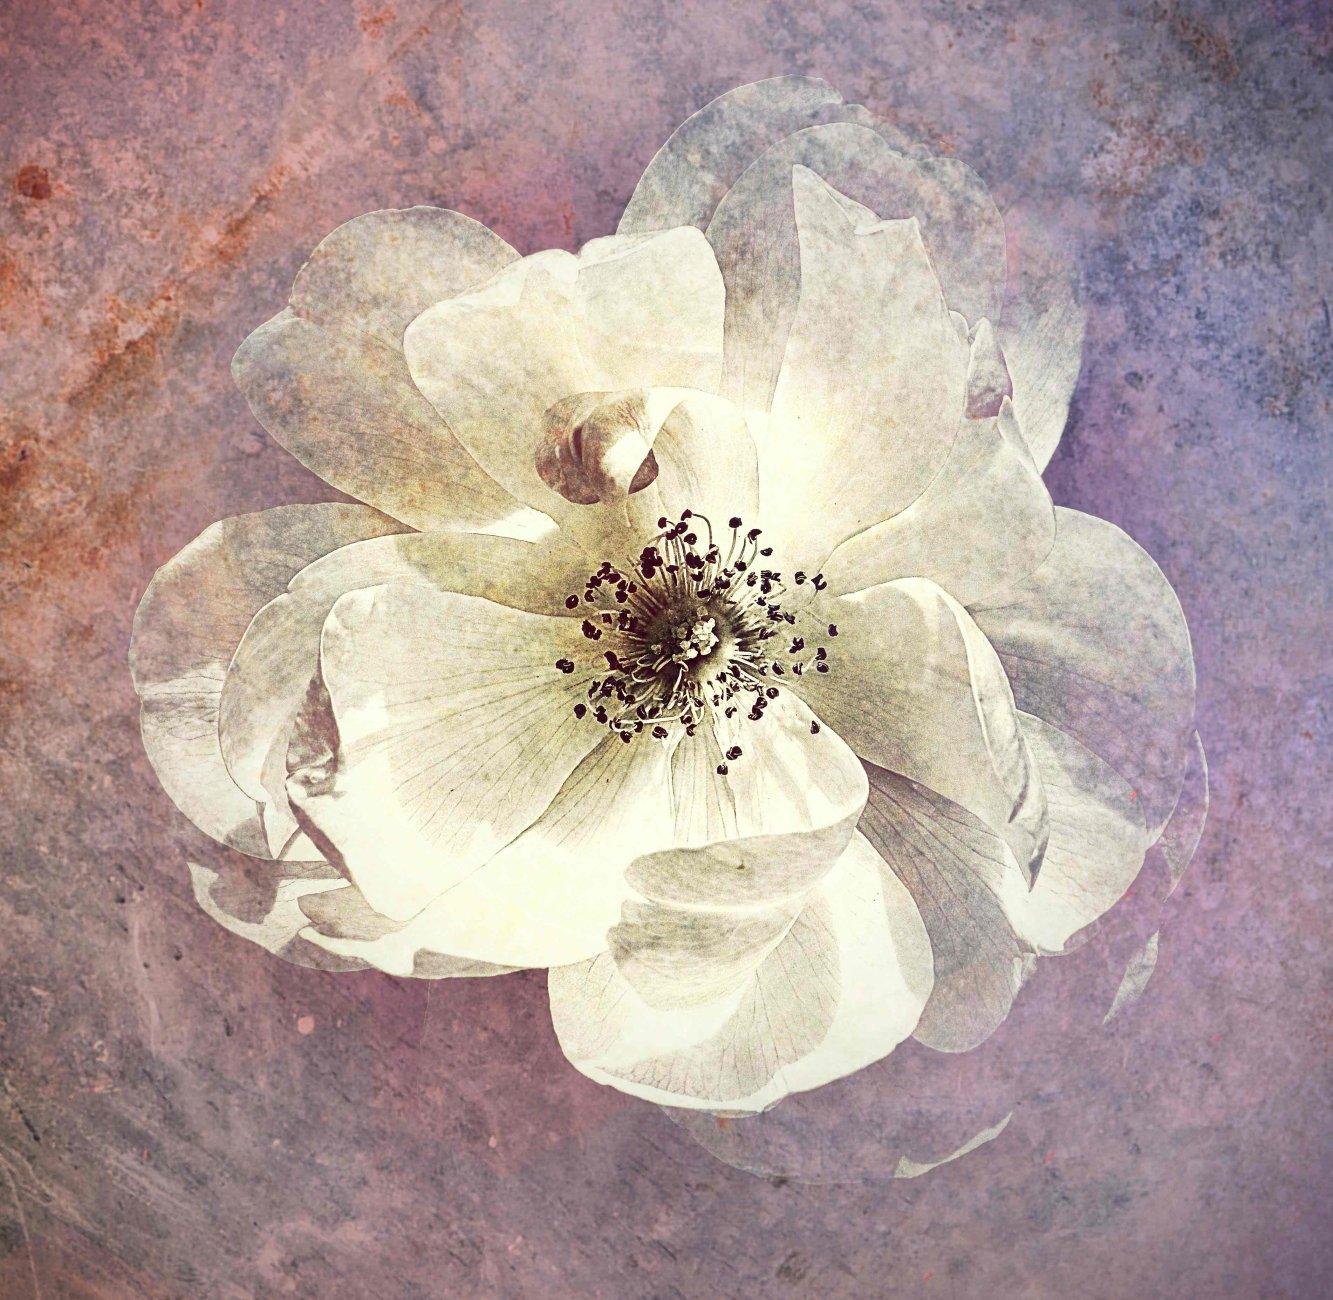 Floral Impressionism